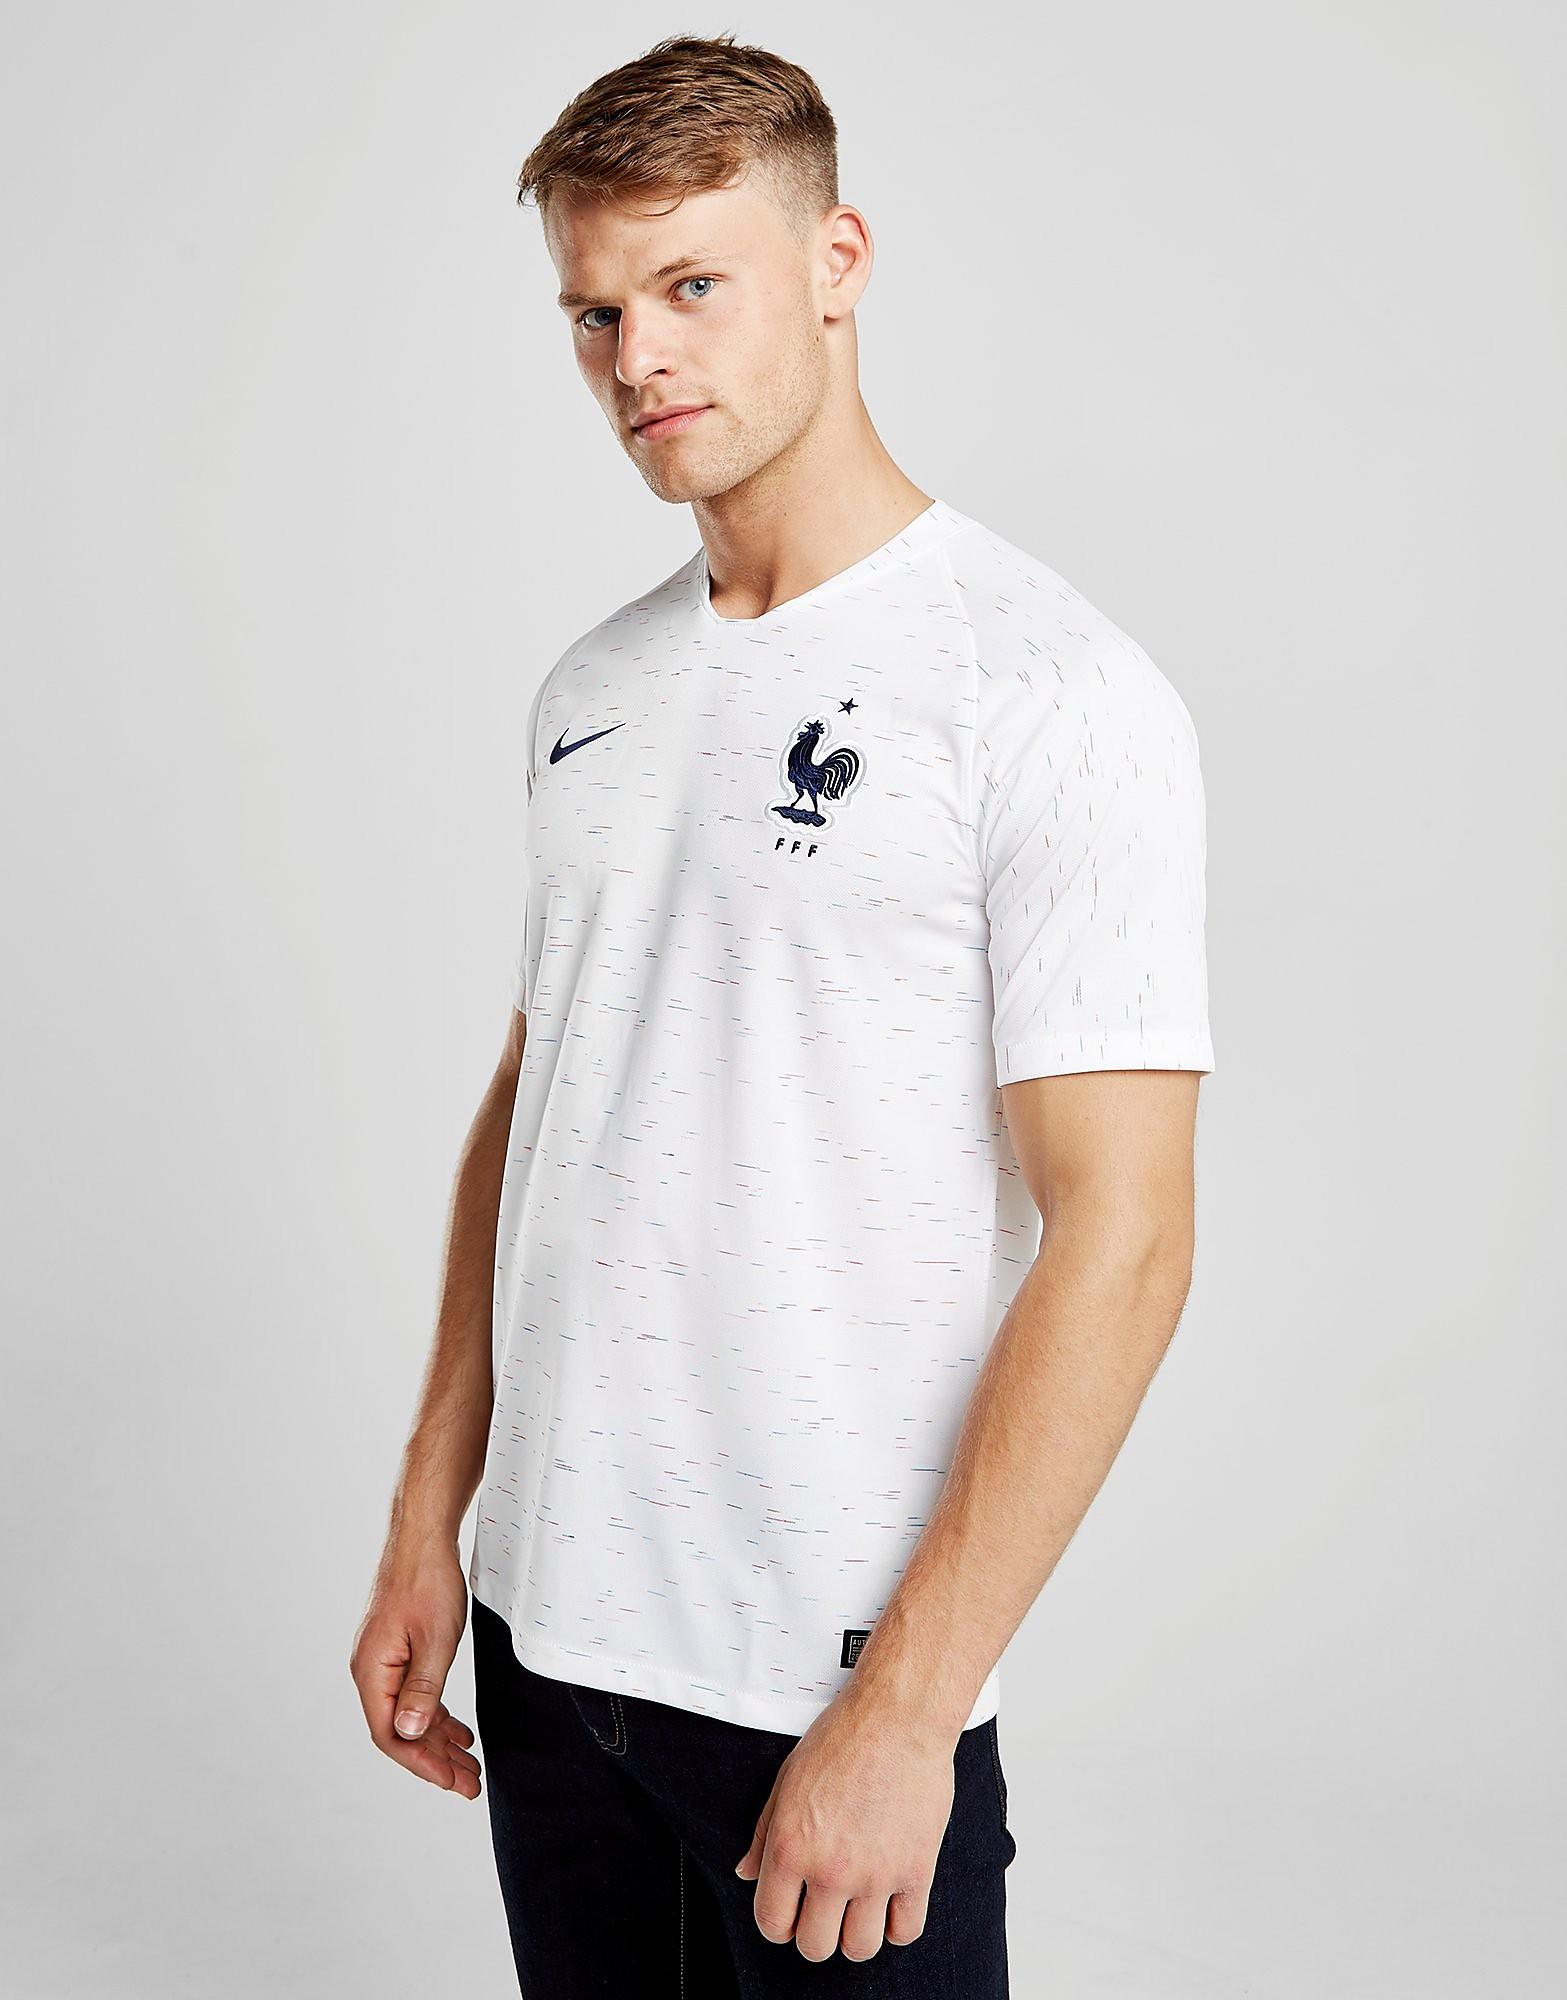 Nike Francia 2018 Maglia Away